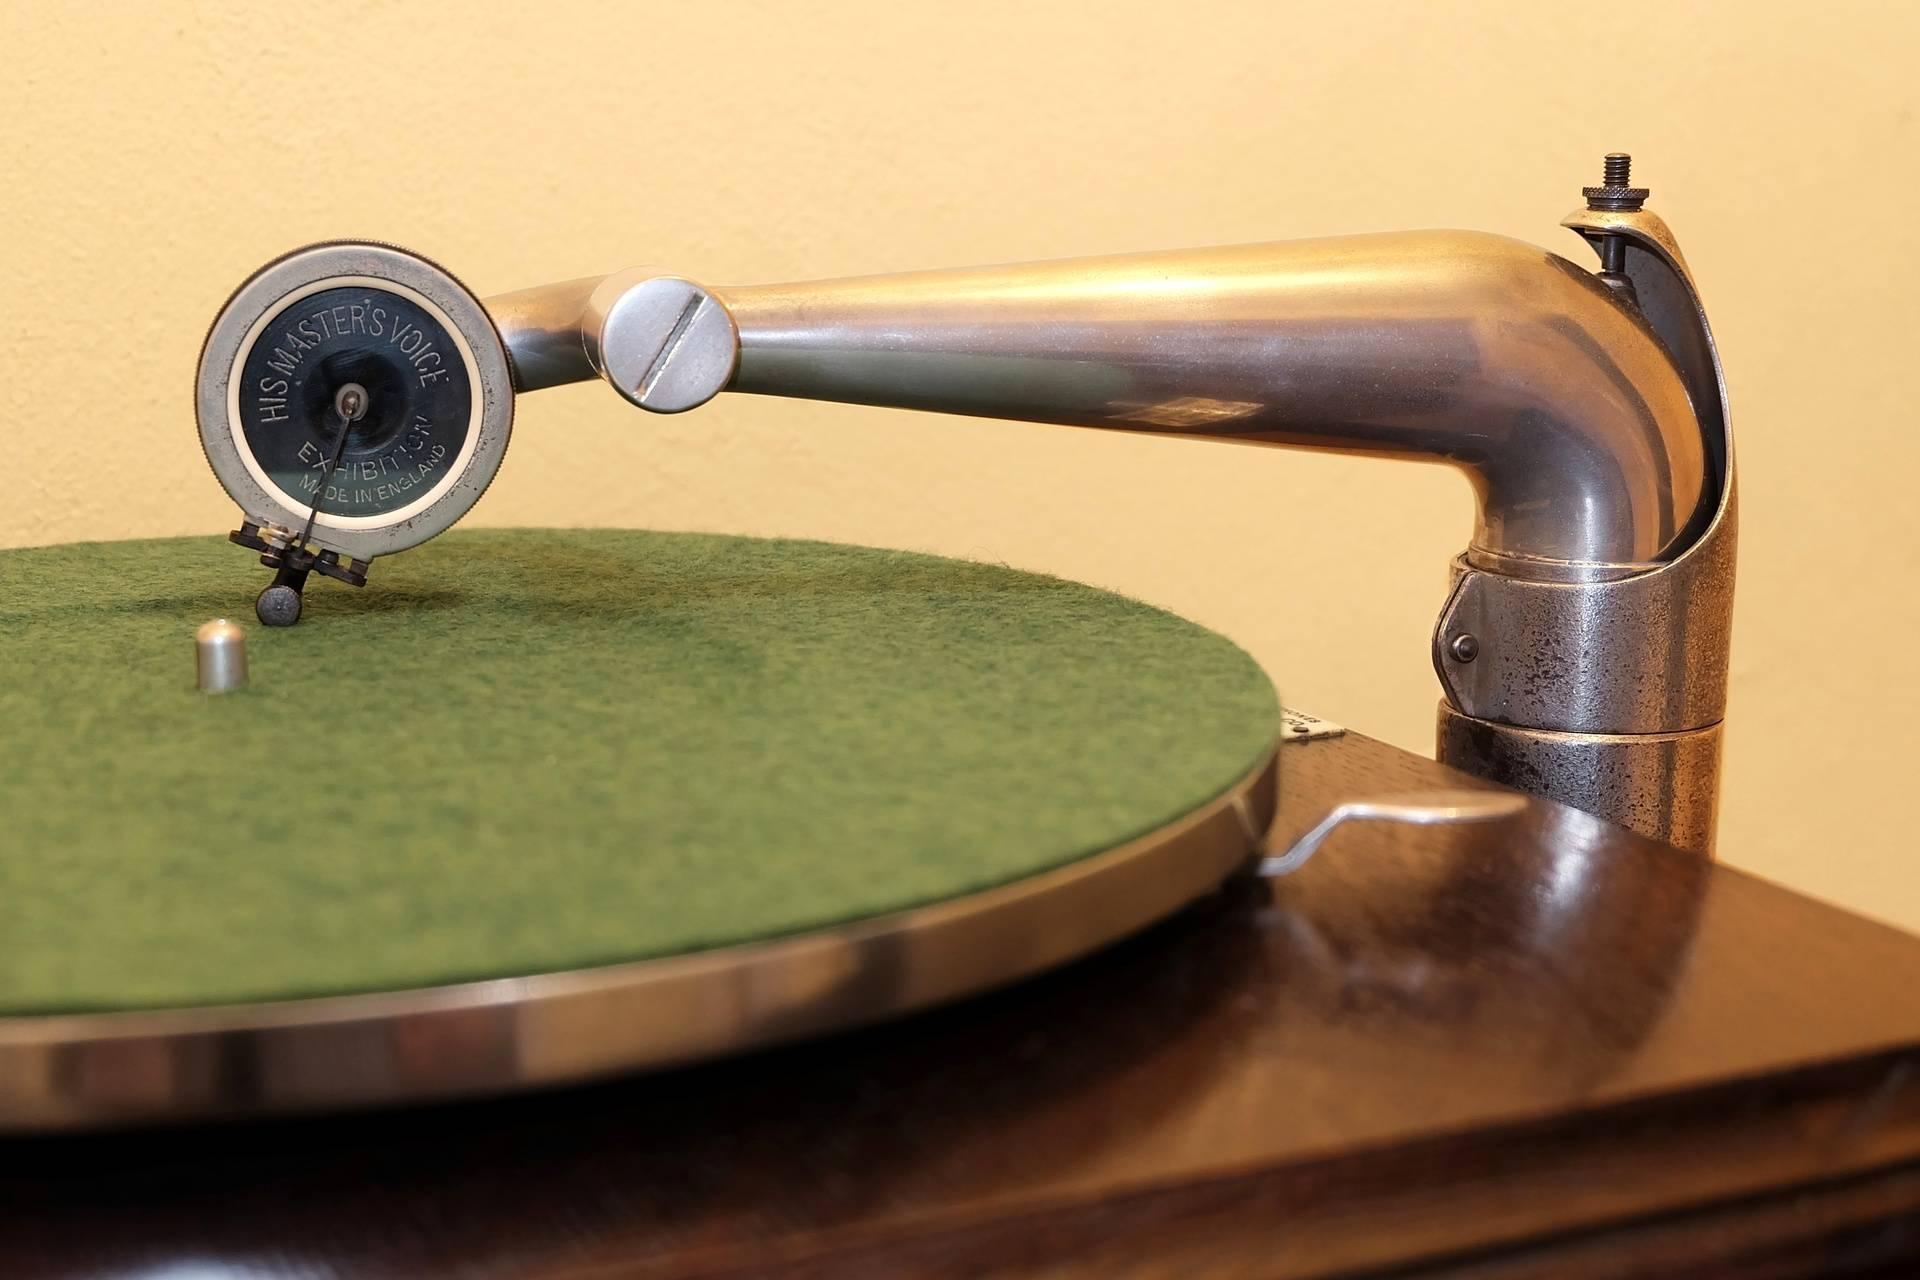 HMV58_008 Tone-arm